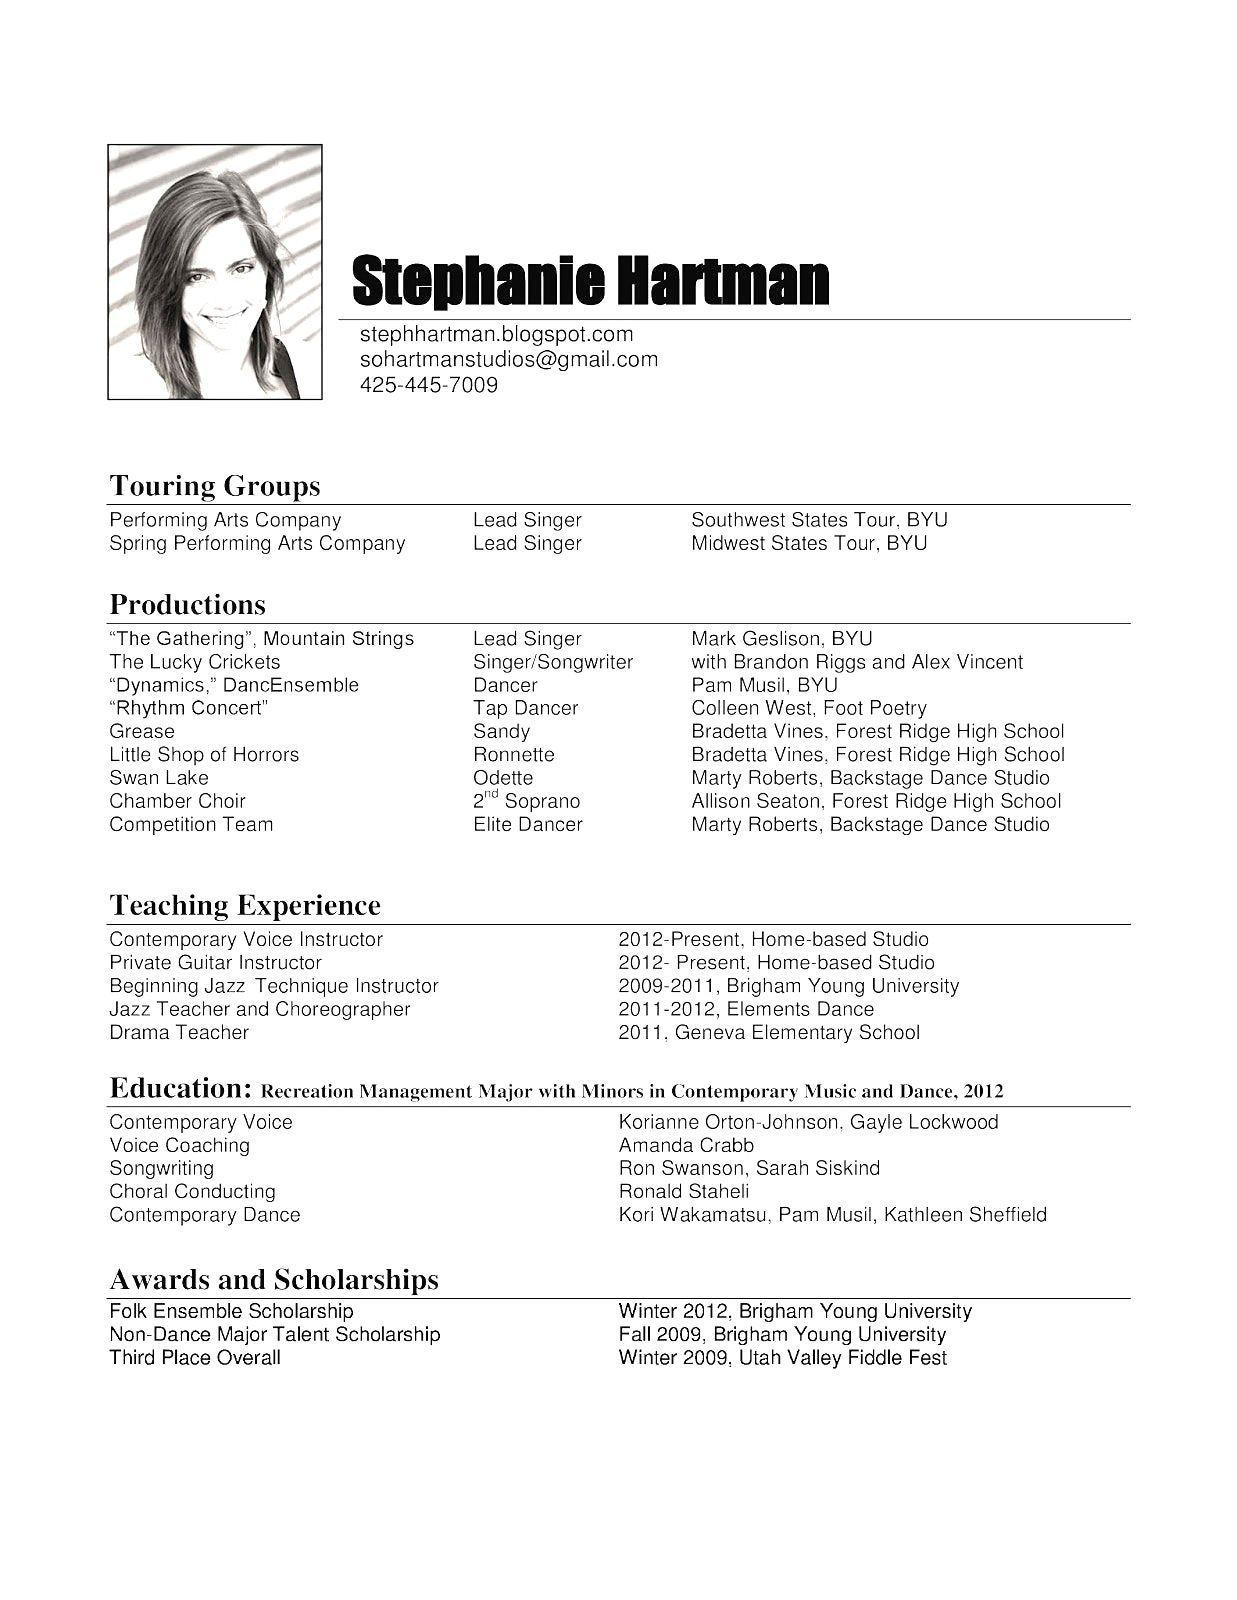 Resume Examples Byu Resume examples, Teacher resume